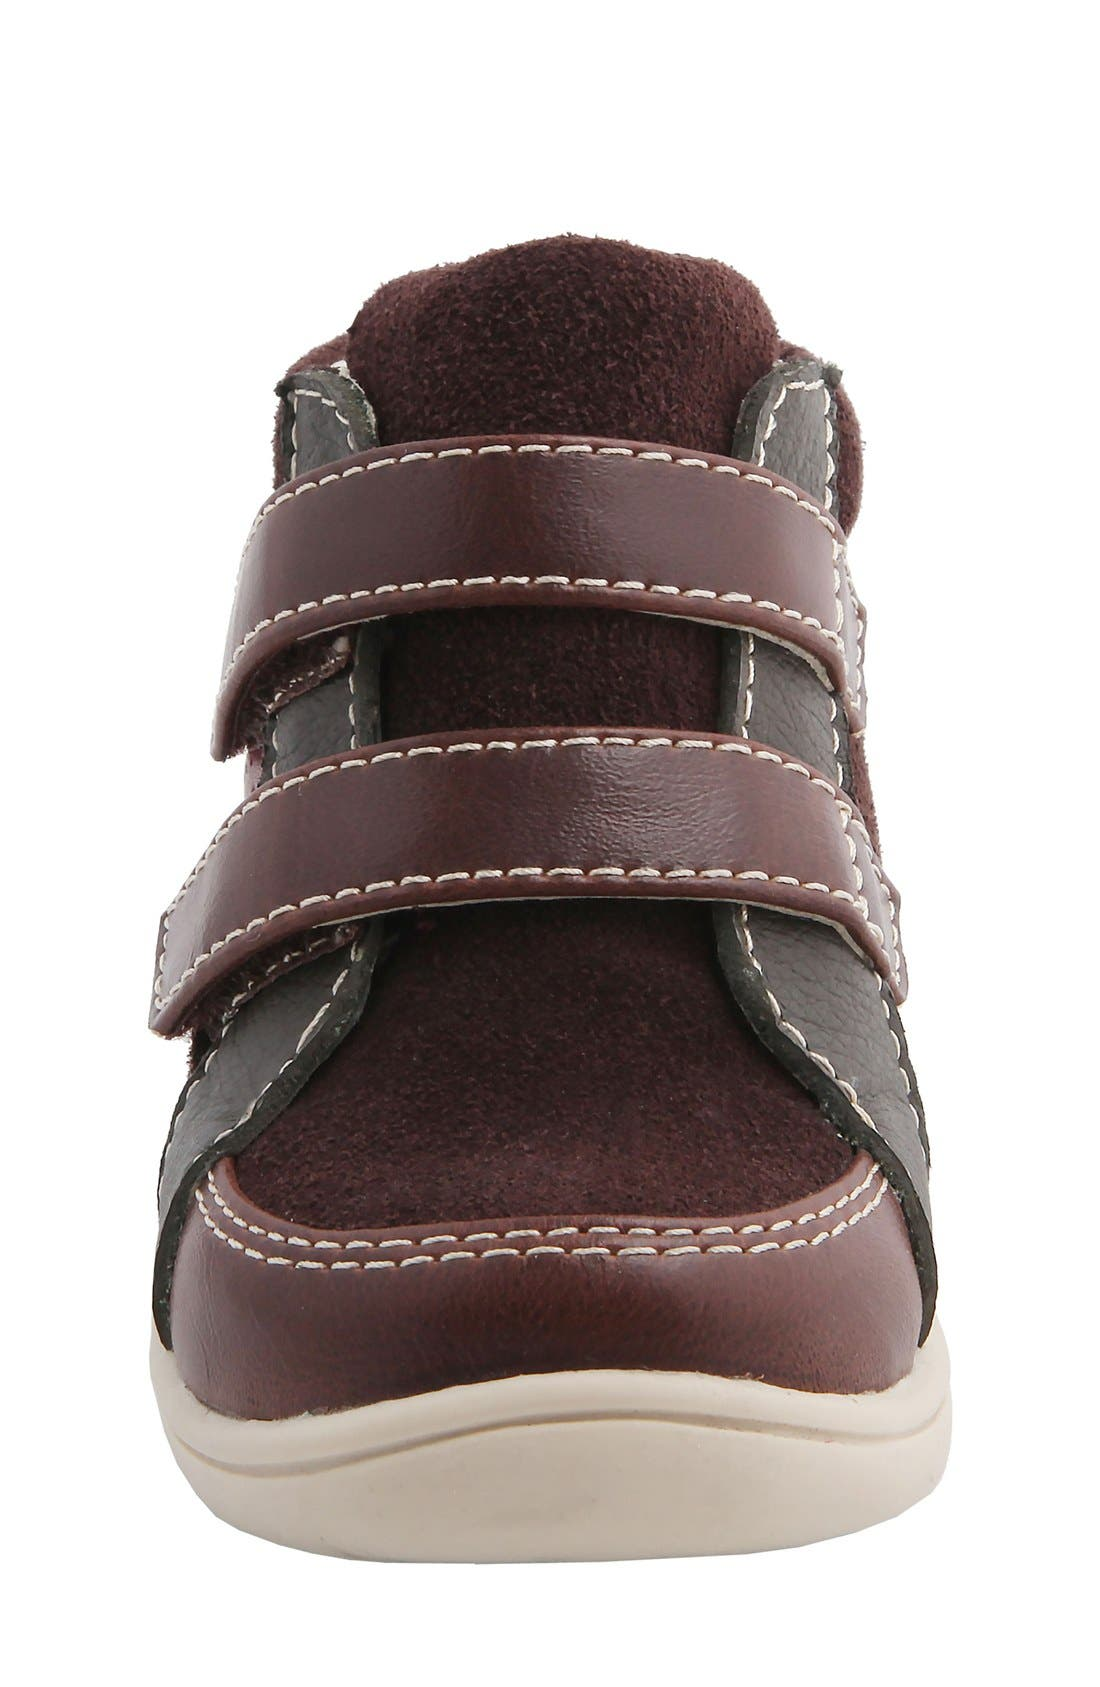 Nina 'Cairo' High Top Sneaker,                             Alternate thumbnail 5, color,                             Brown Suede